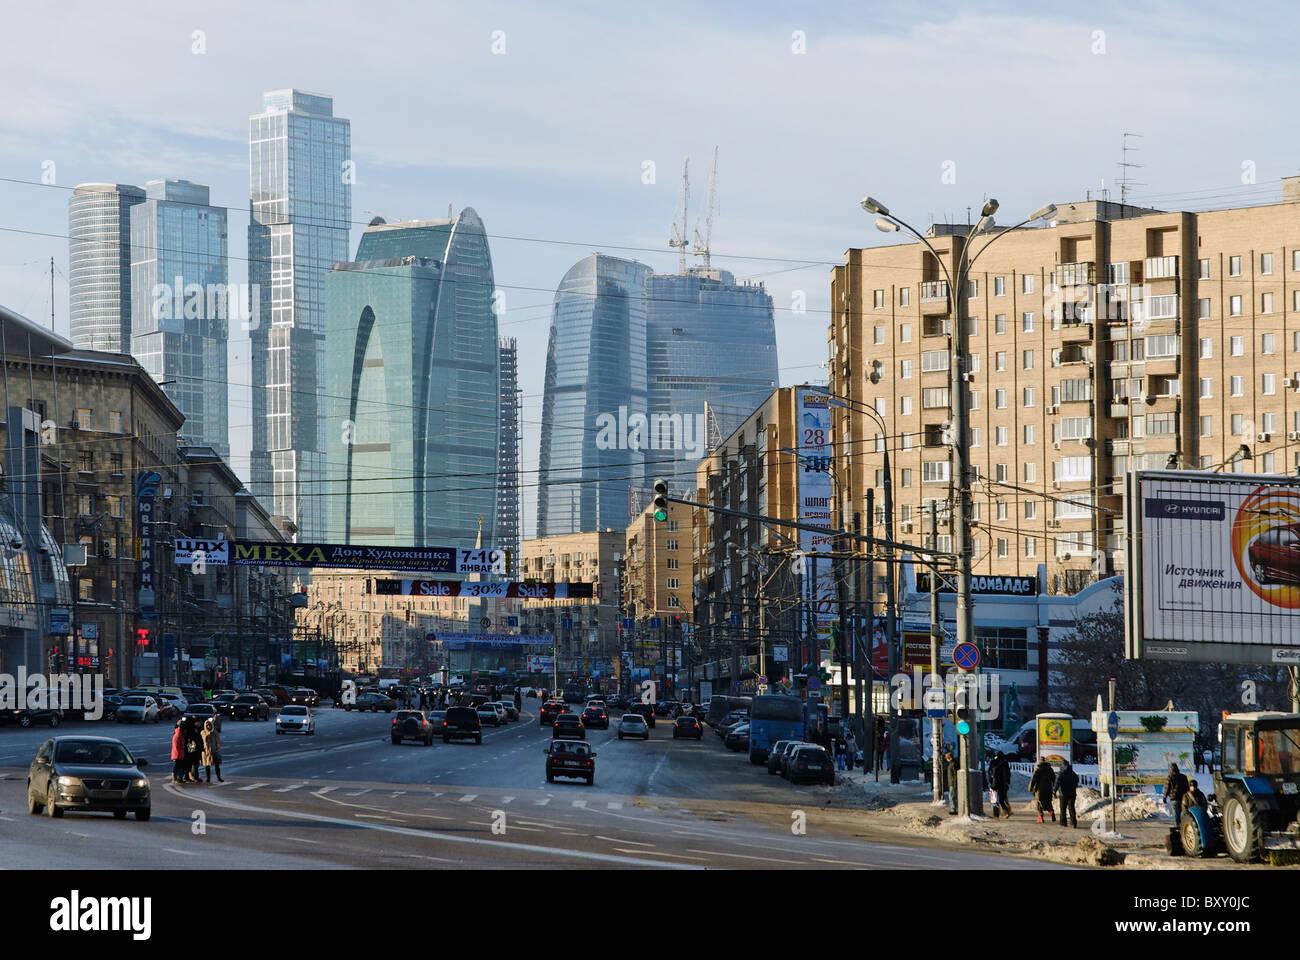 Bolshaya Dorogomilovskaya street in Moscow - Stock Image